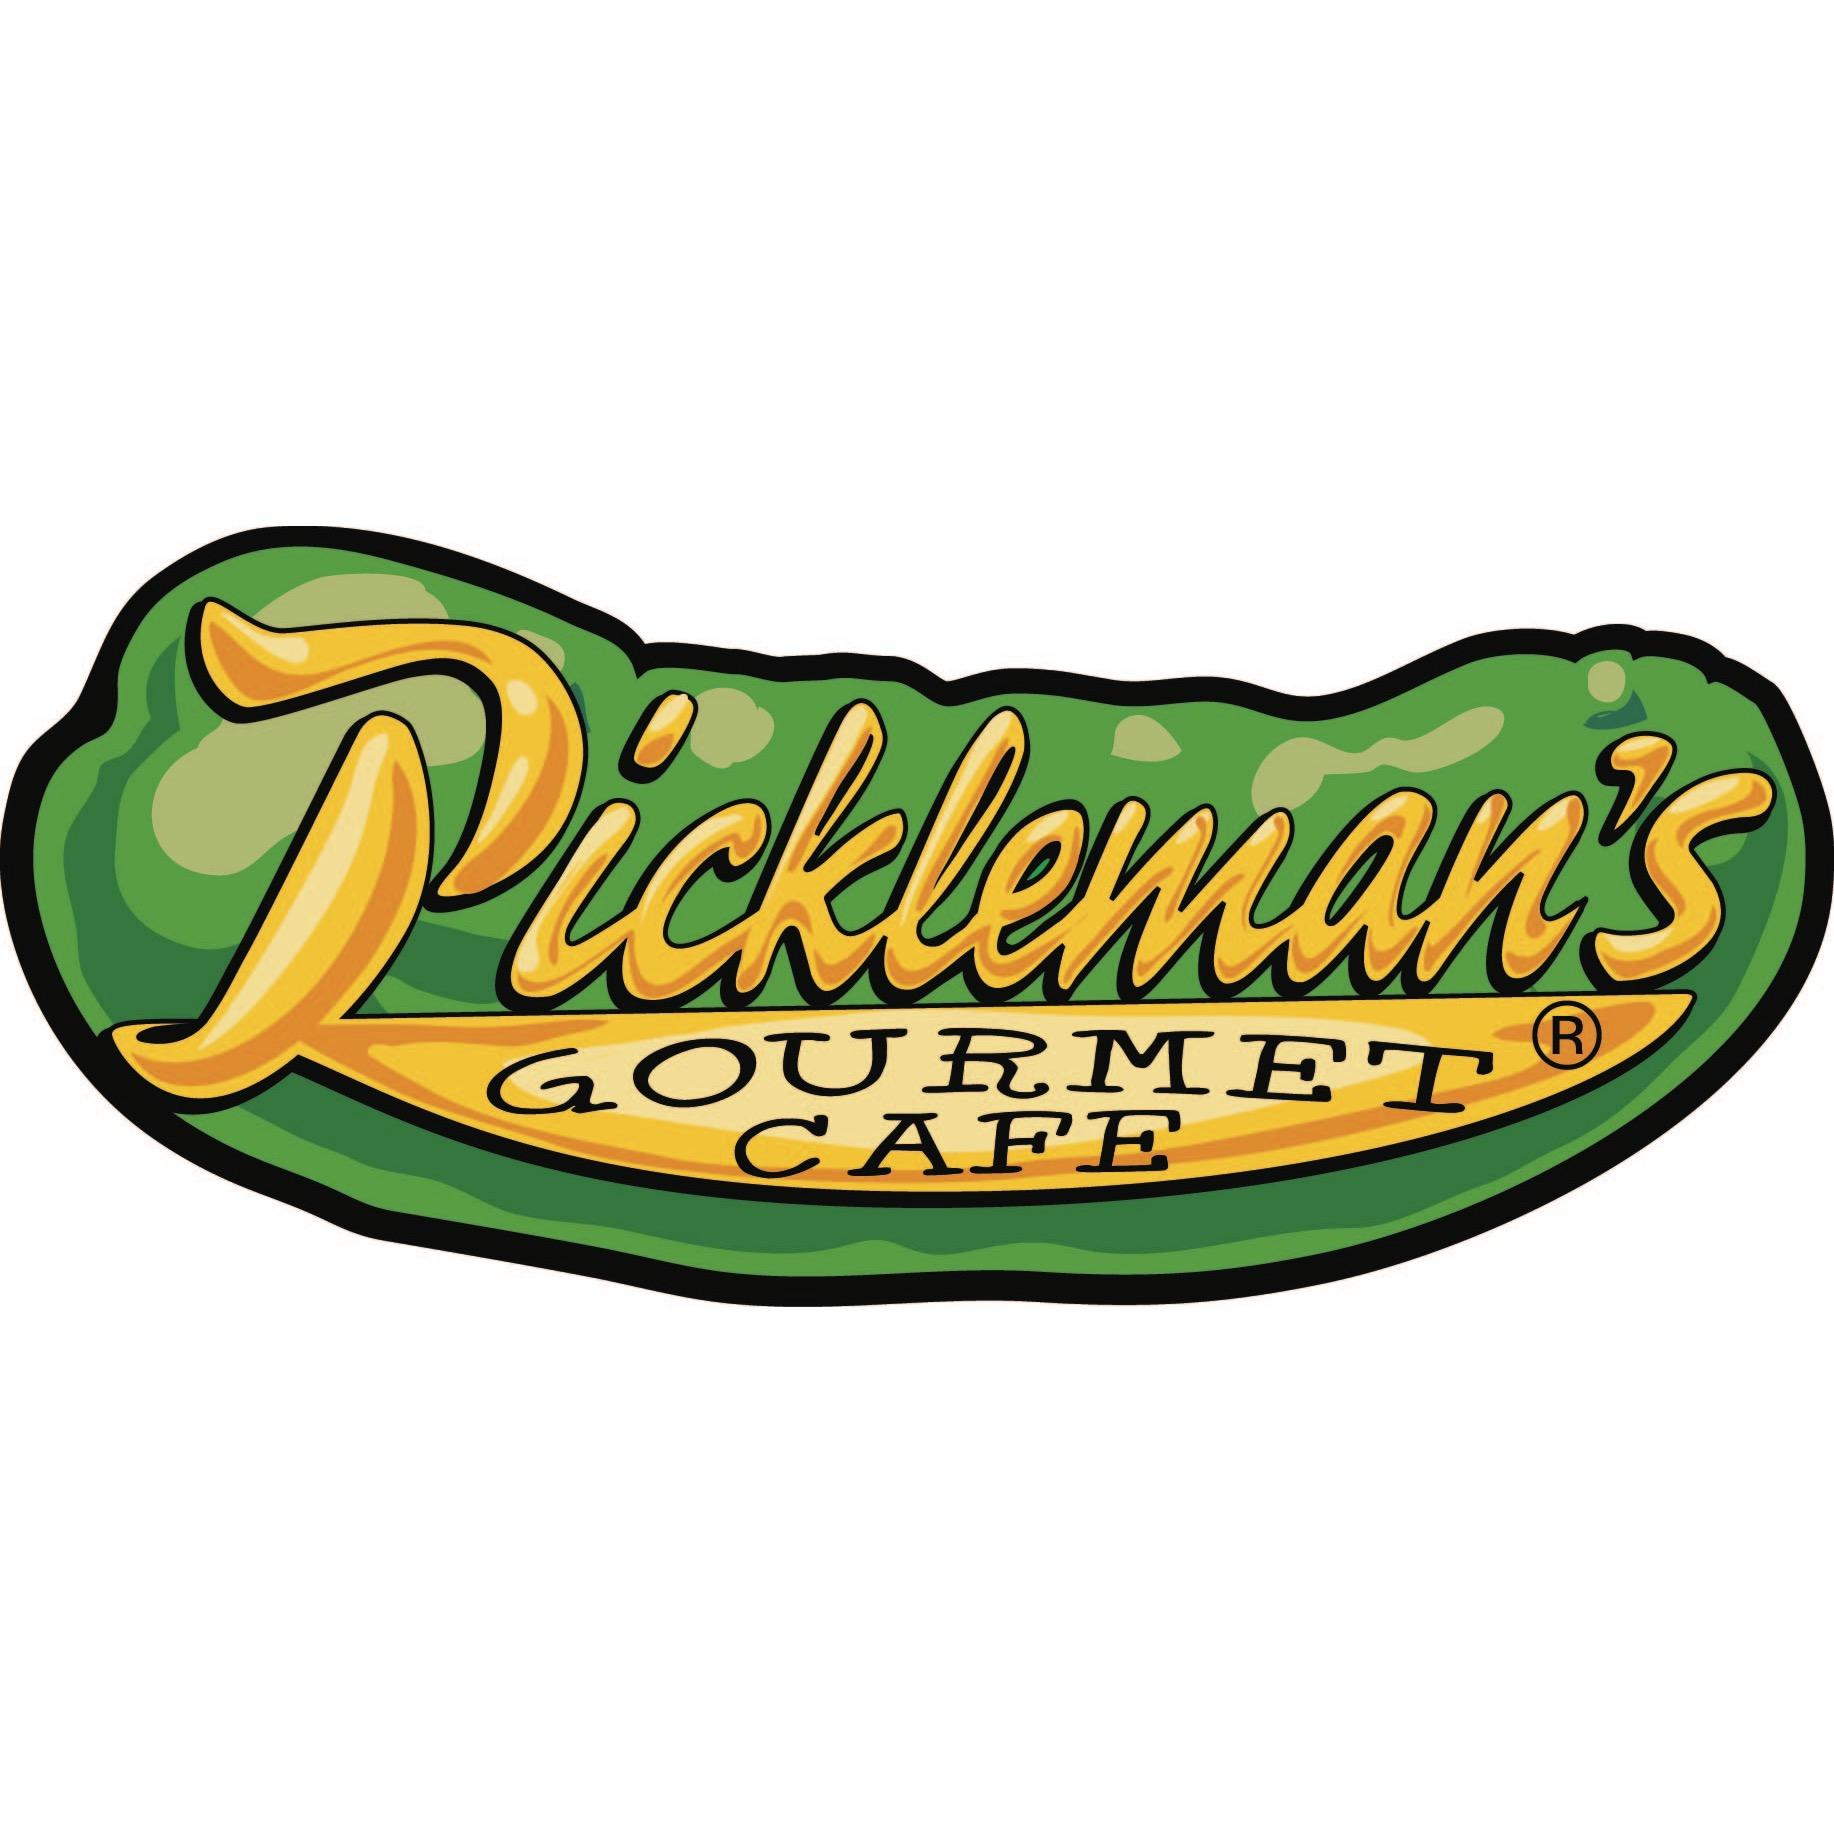 Pickleman's Gourmet Cafe image 11